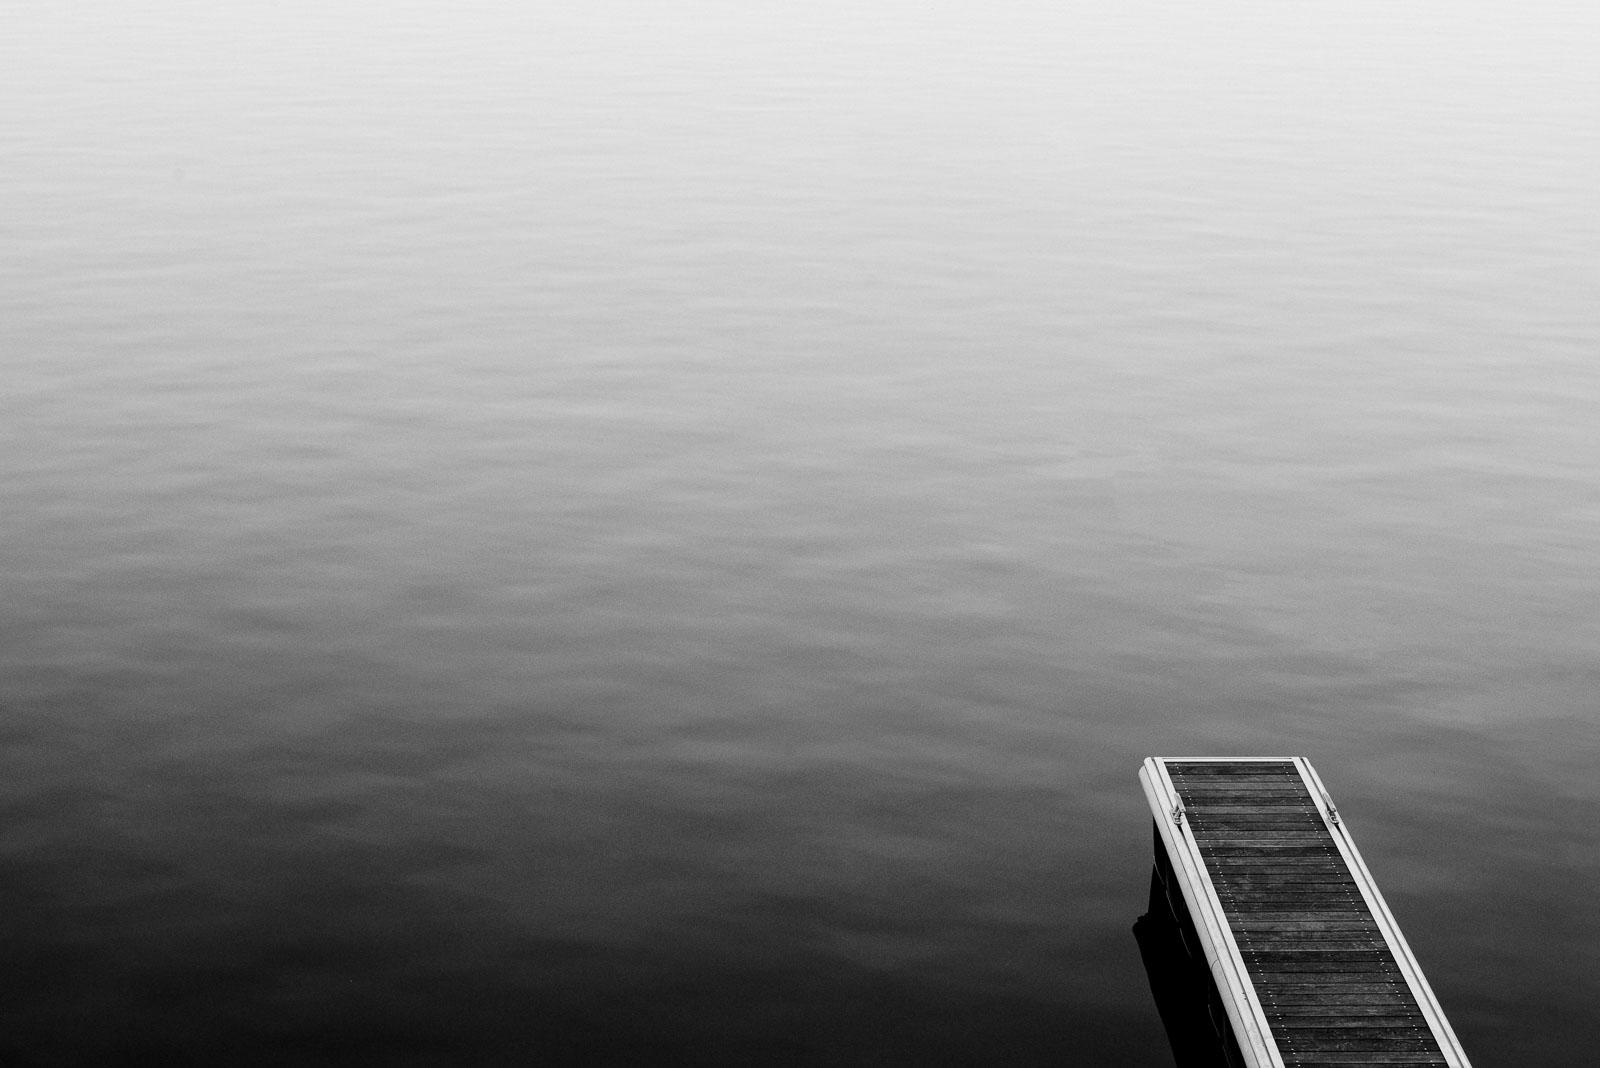 Минимализм в фотографии || Minimalist photography tips from Dana Walton